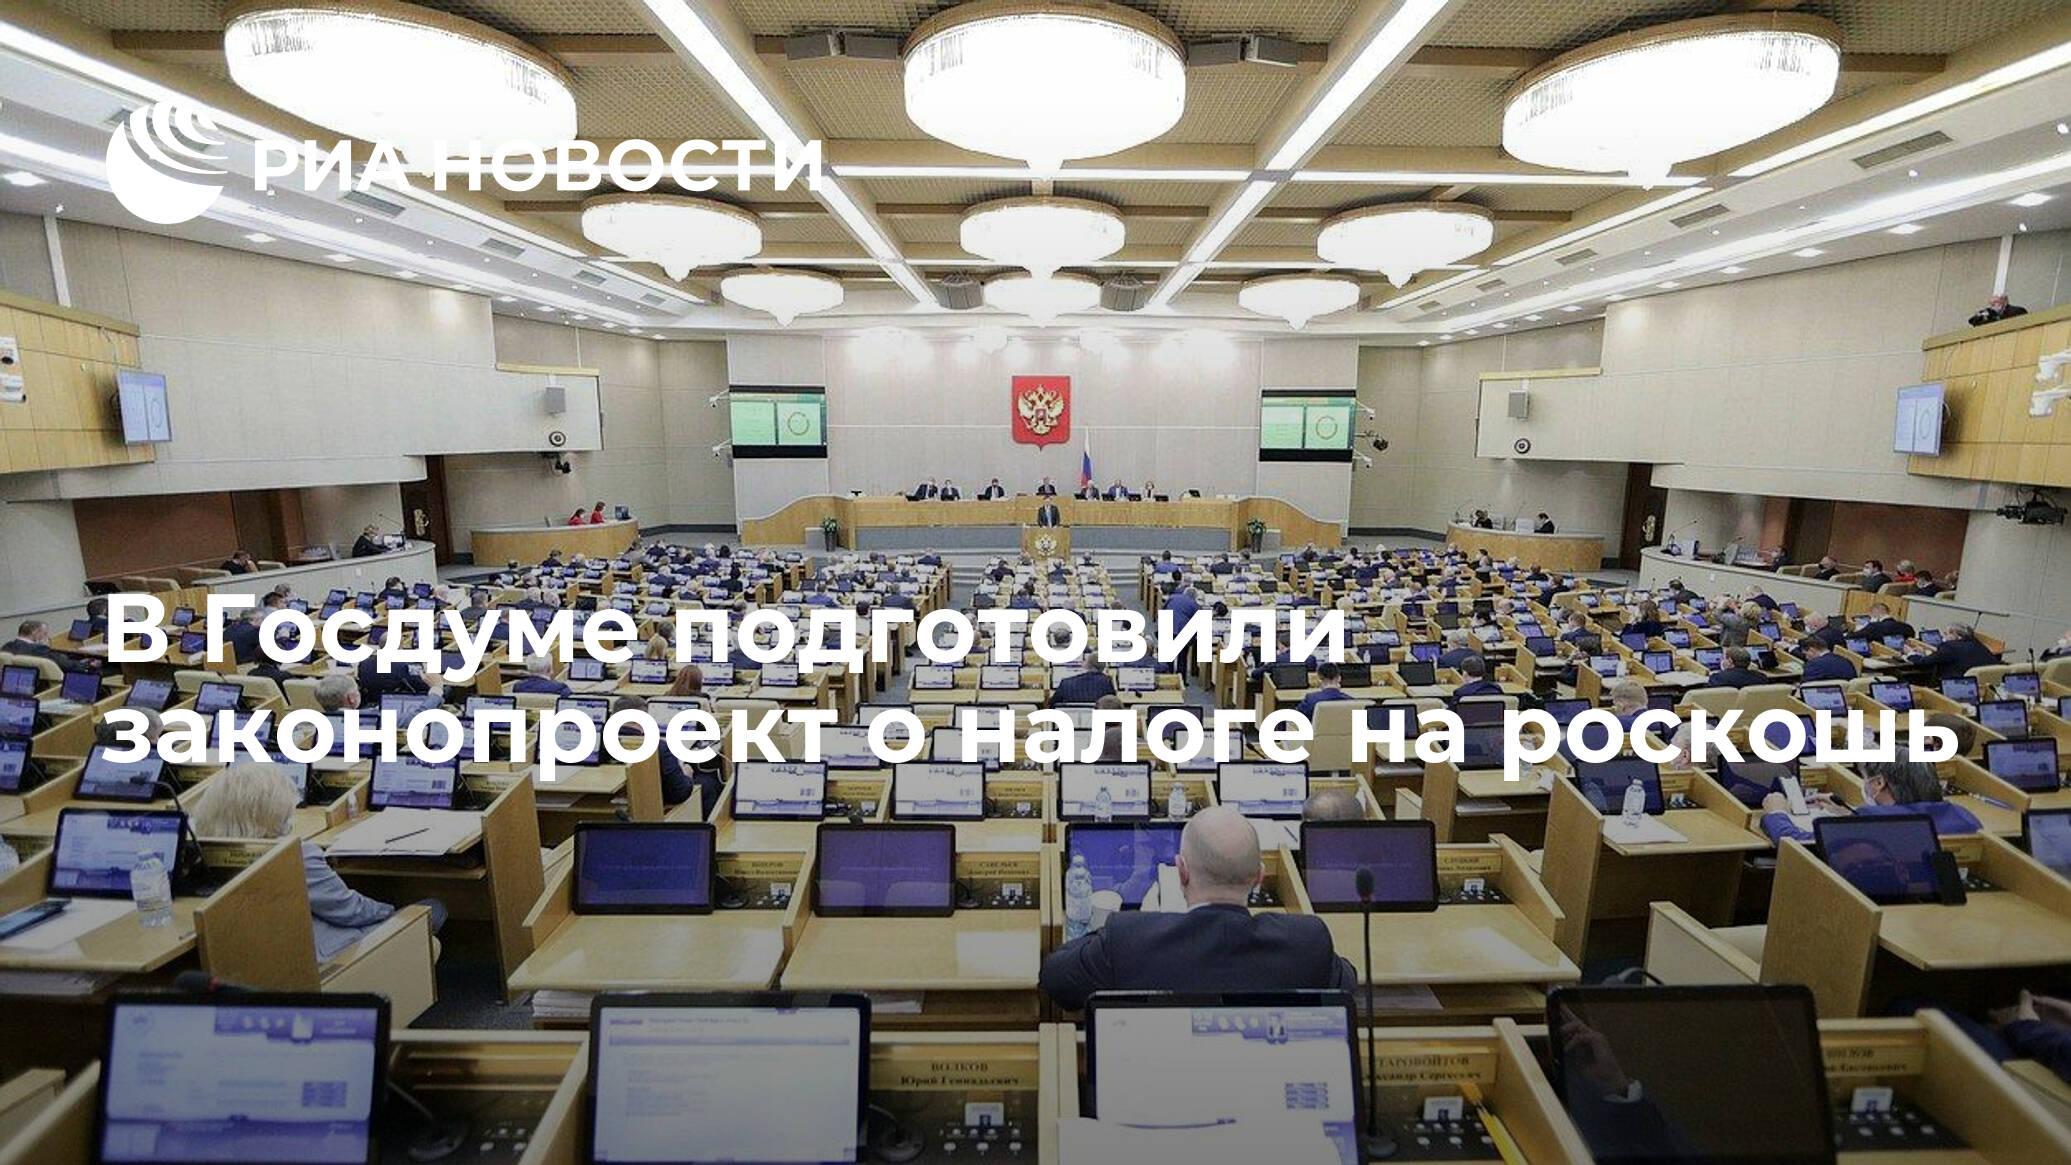 В Госдуме подготовили законопроект о налоге на роскошь